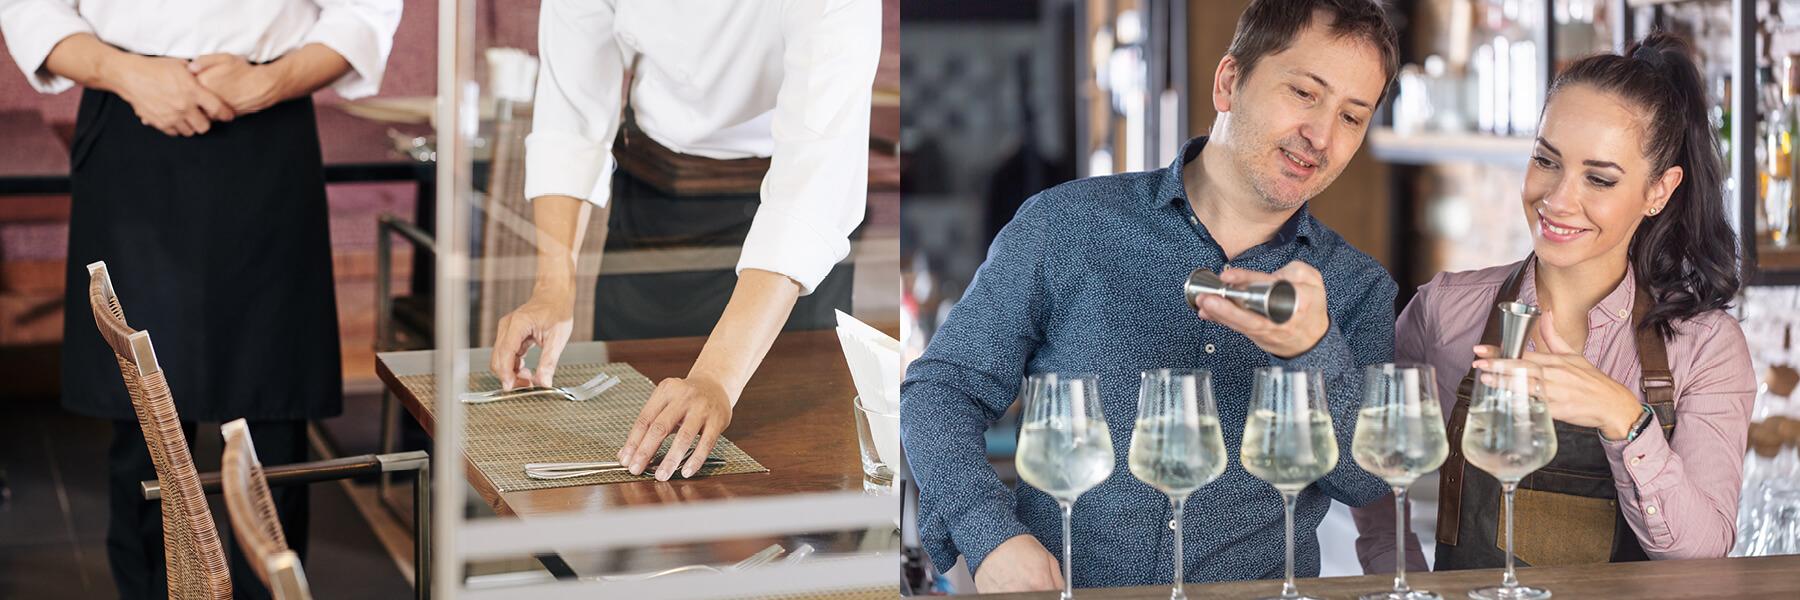 Serveur en salle/barman